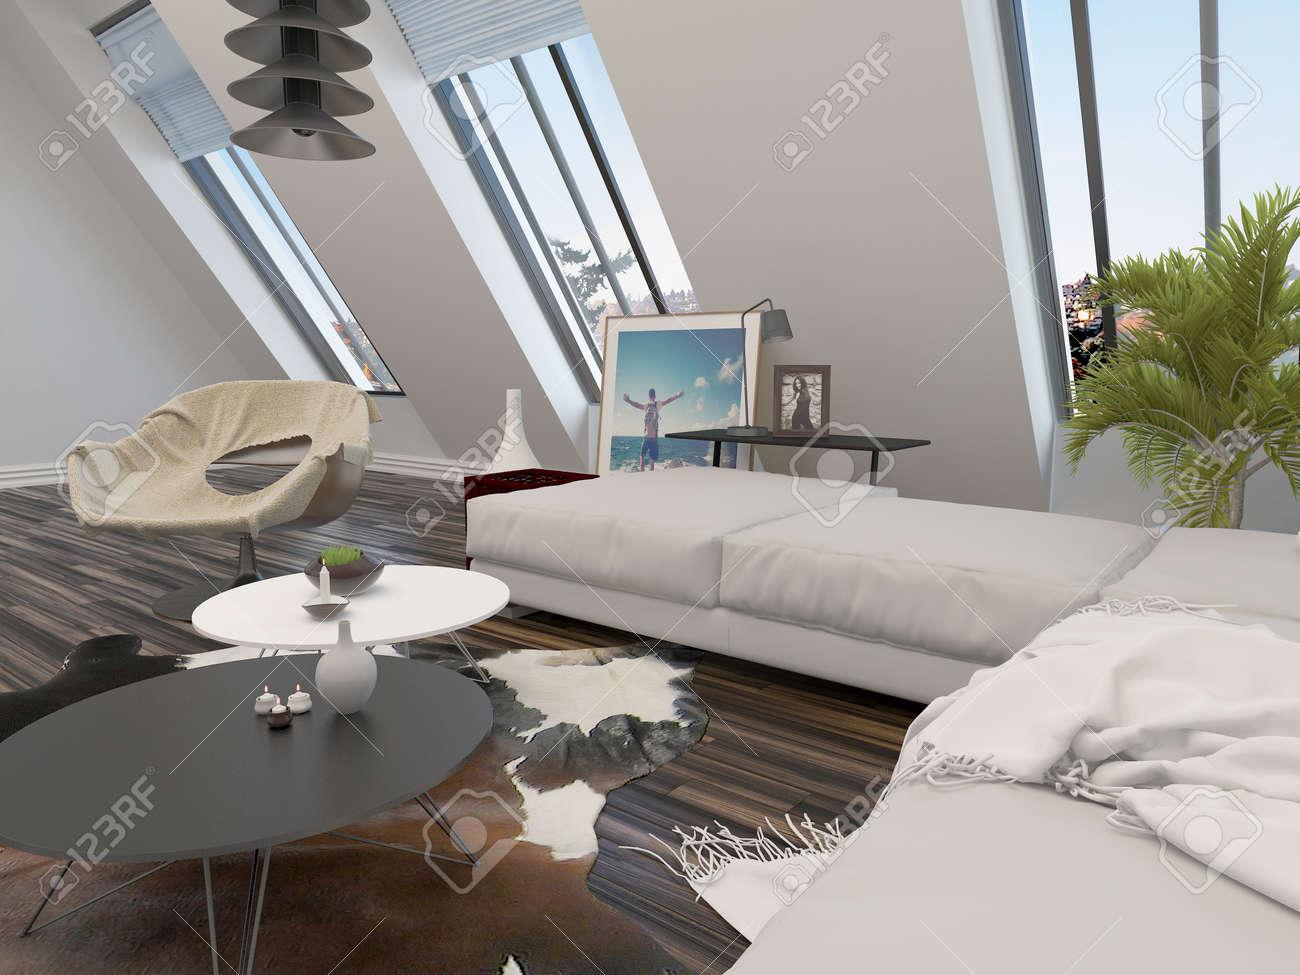 Lichte Luchtige Moderne Woonkamer Interieur Met Een Crème Modulaire ...